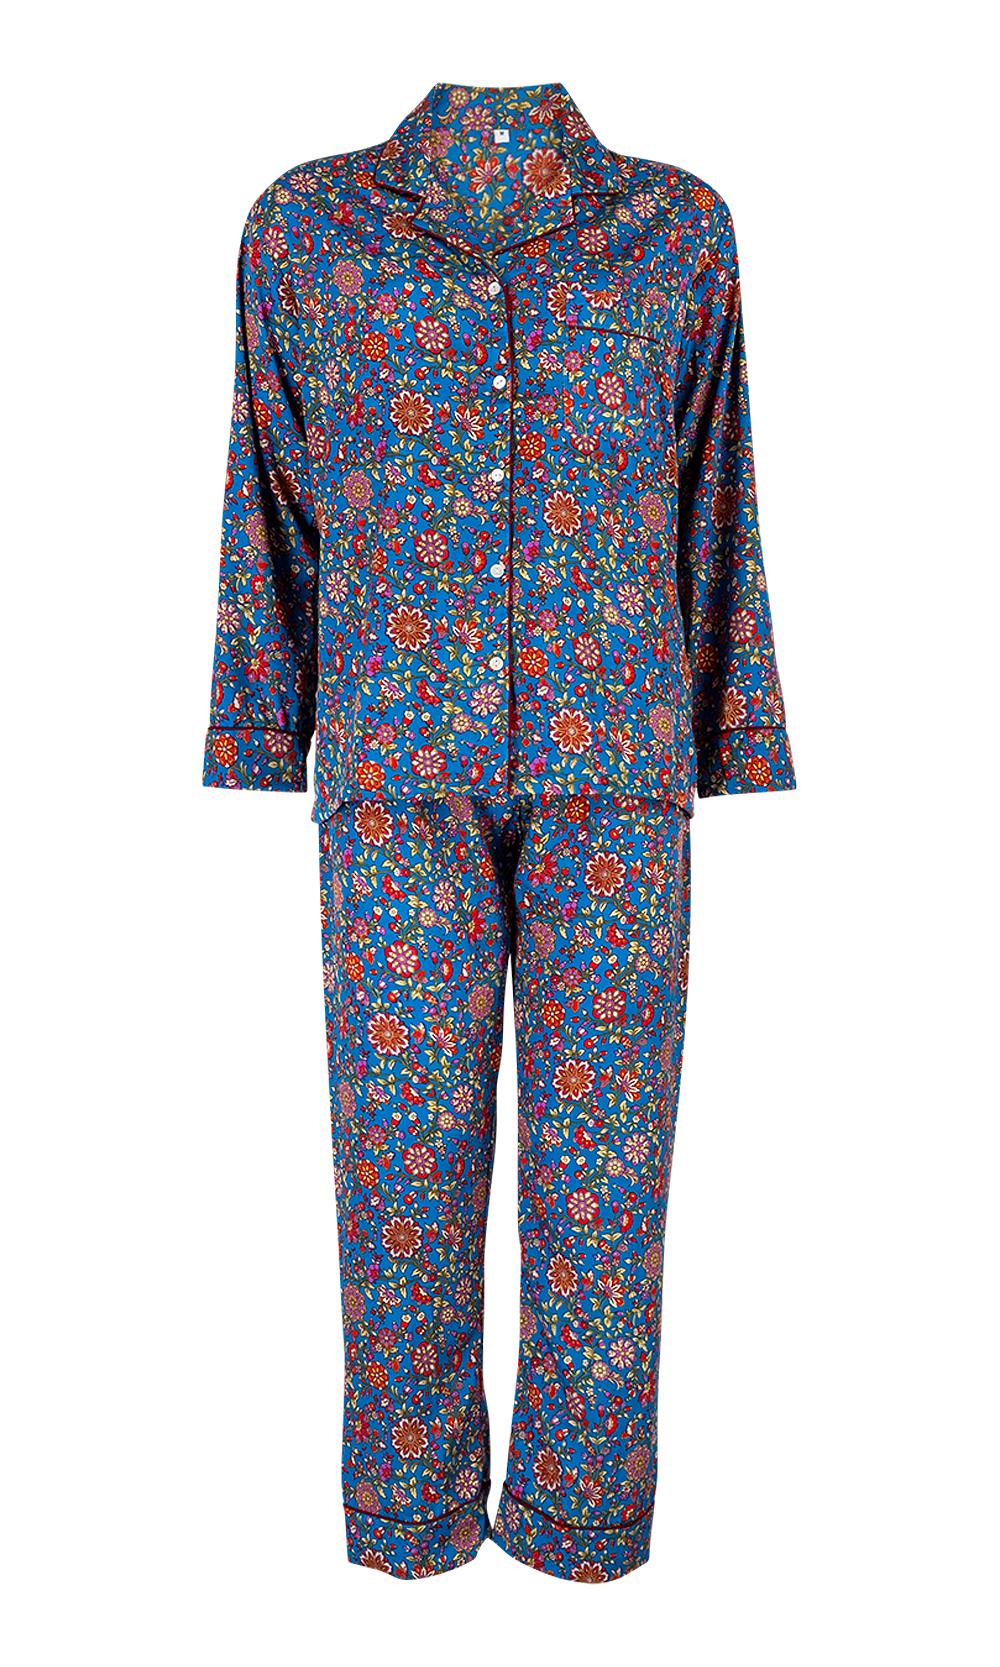 Blue Luxurious Sleepwear & Pyjamas Set - Set